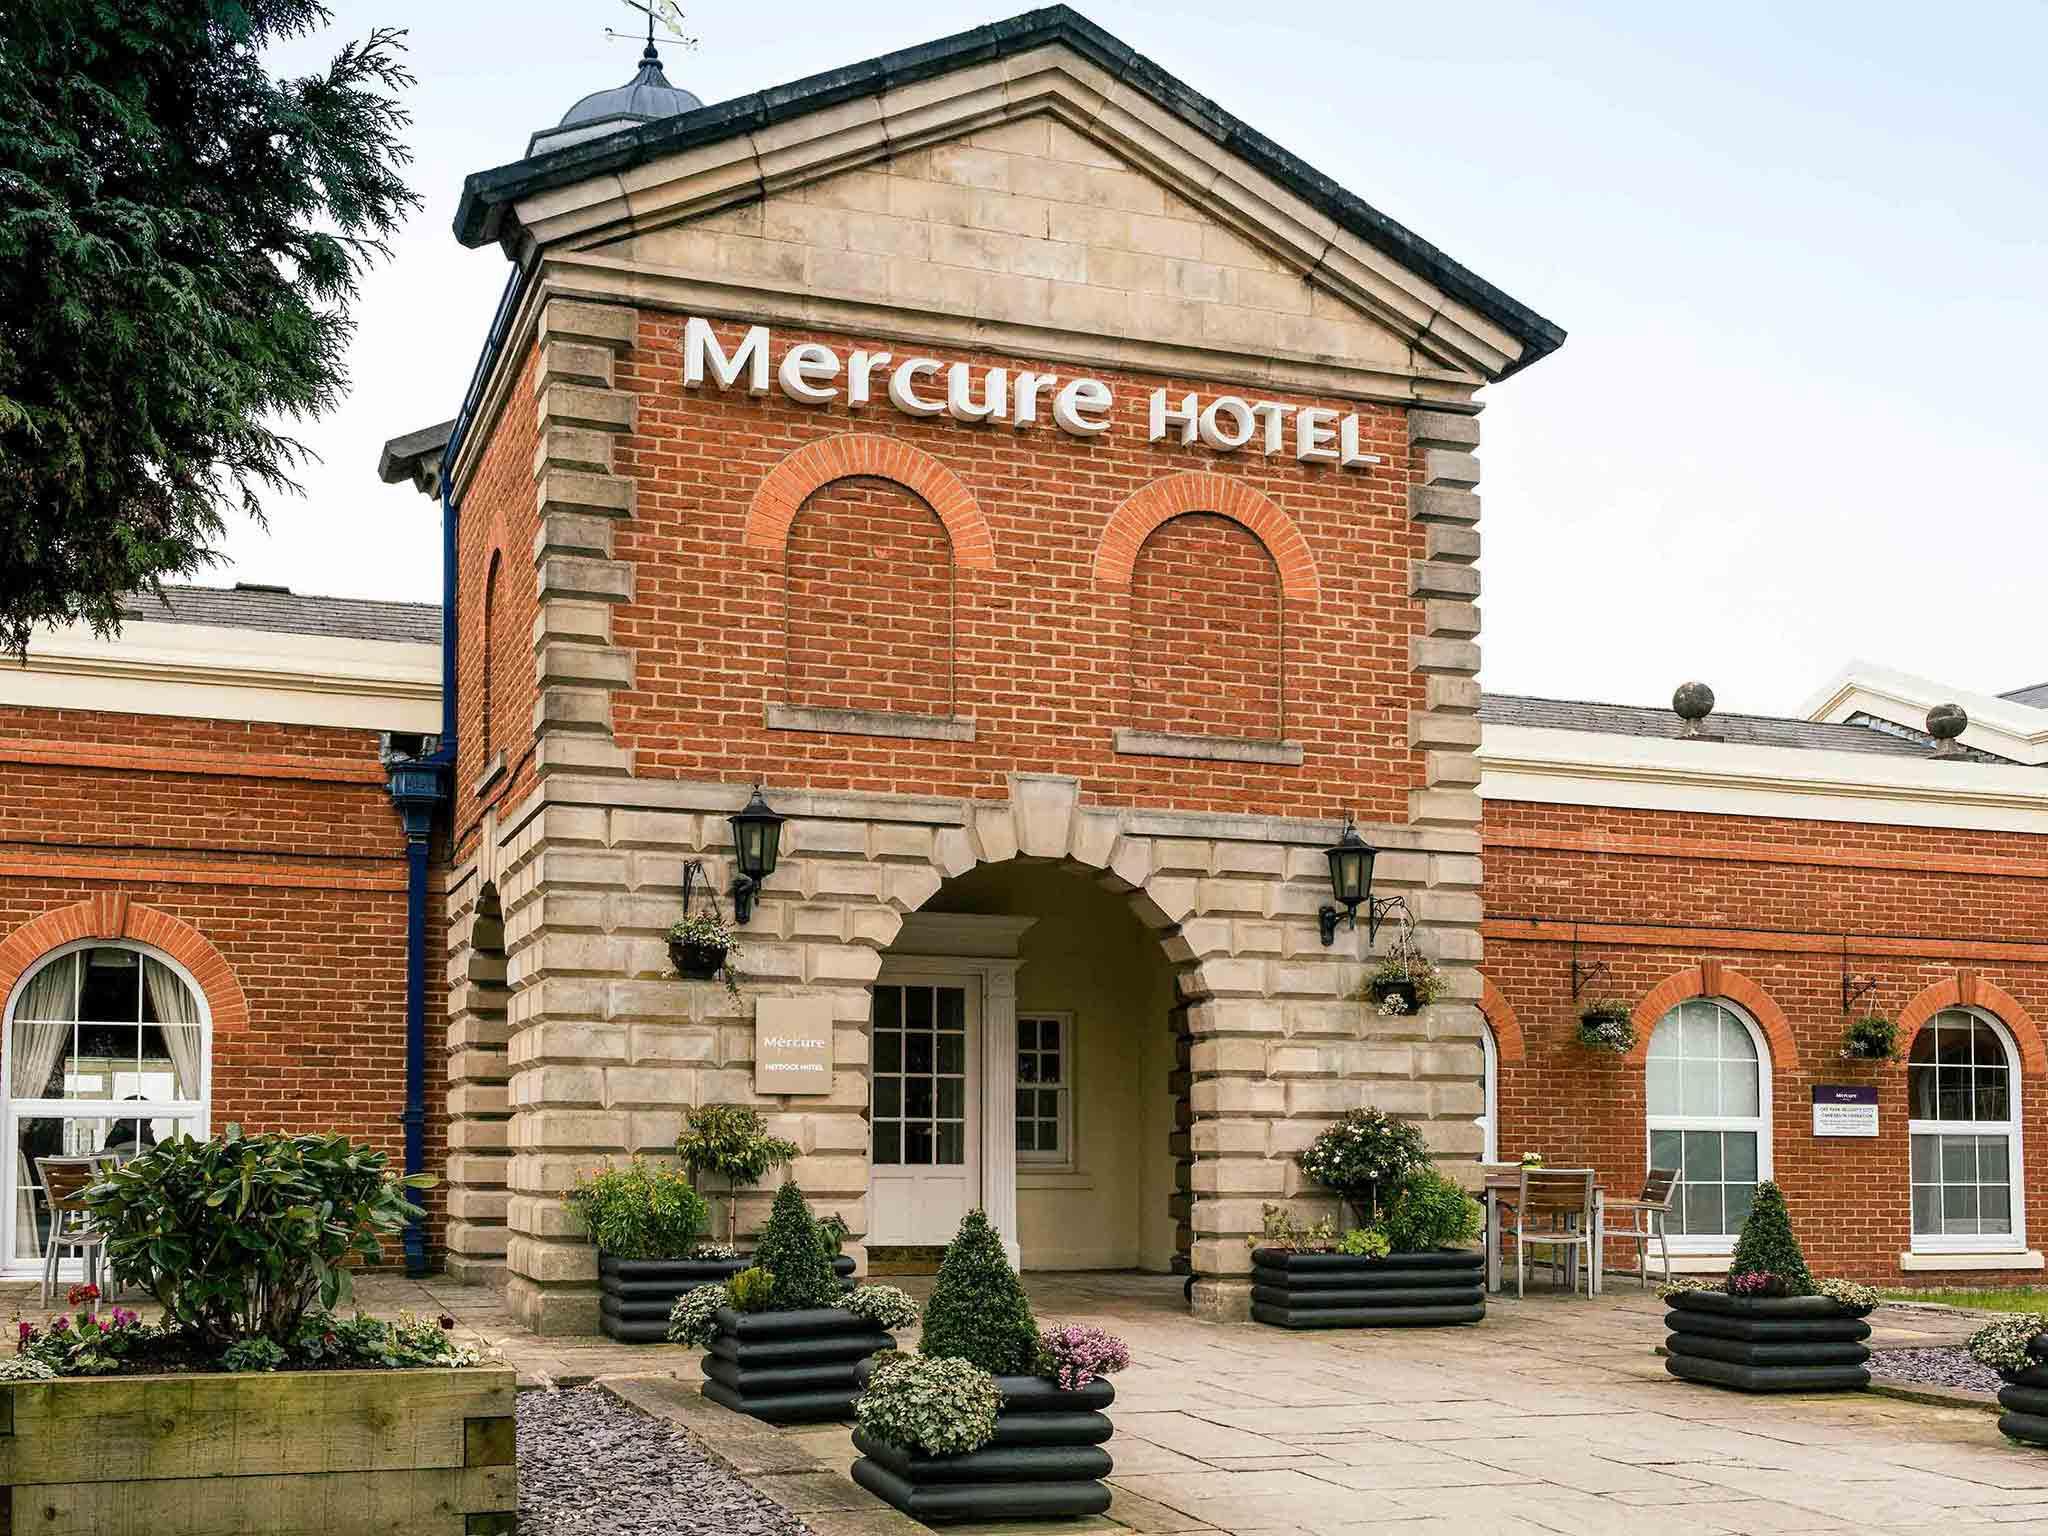 Hotel – Mercure Haydock Hotel (recentemente remodelado)